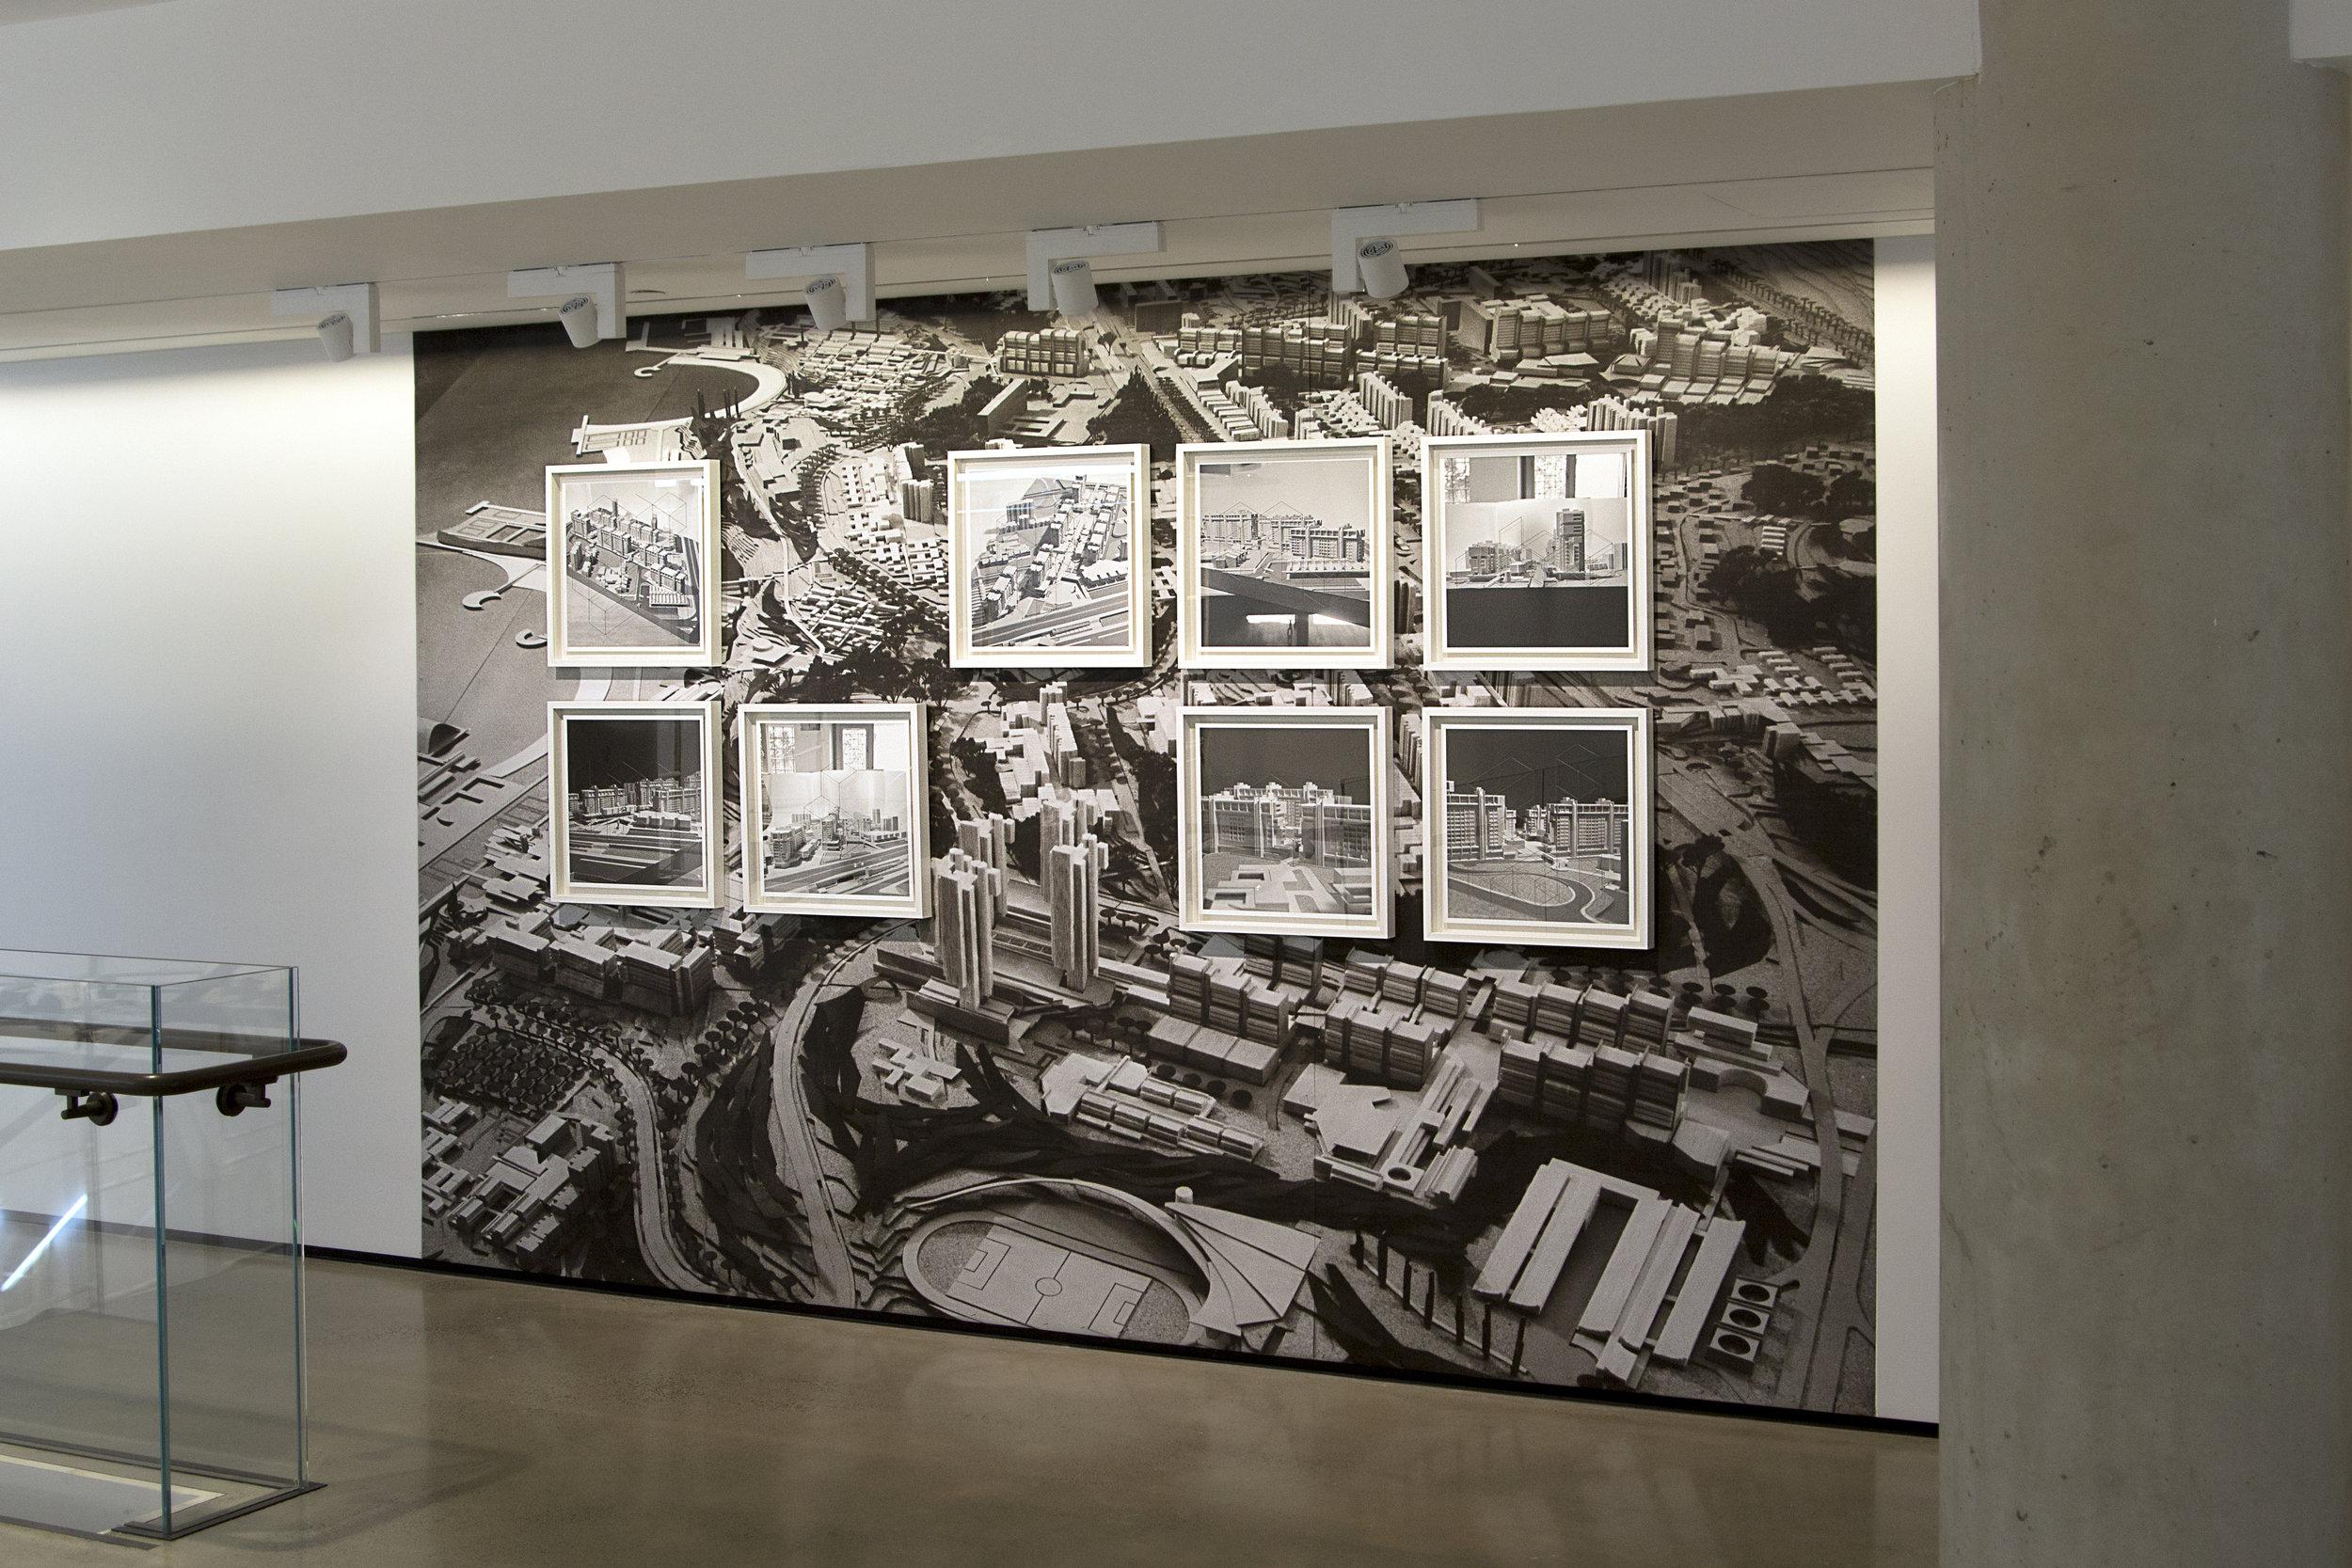 Untitled (Archive ST3) , 2015  8 digital prints on paper, graphite sticks, installed on digital print on paper  Framed: 20.47 x 20.47 x 1.57 in. (44,5 x 44,5 x 2 cm /framed 52 x 52 x 4 cm)